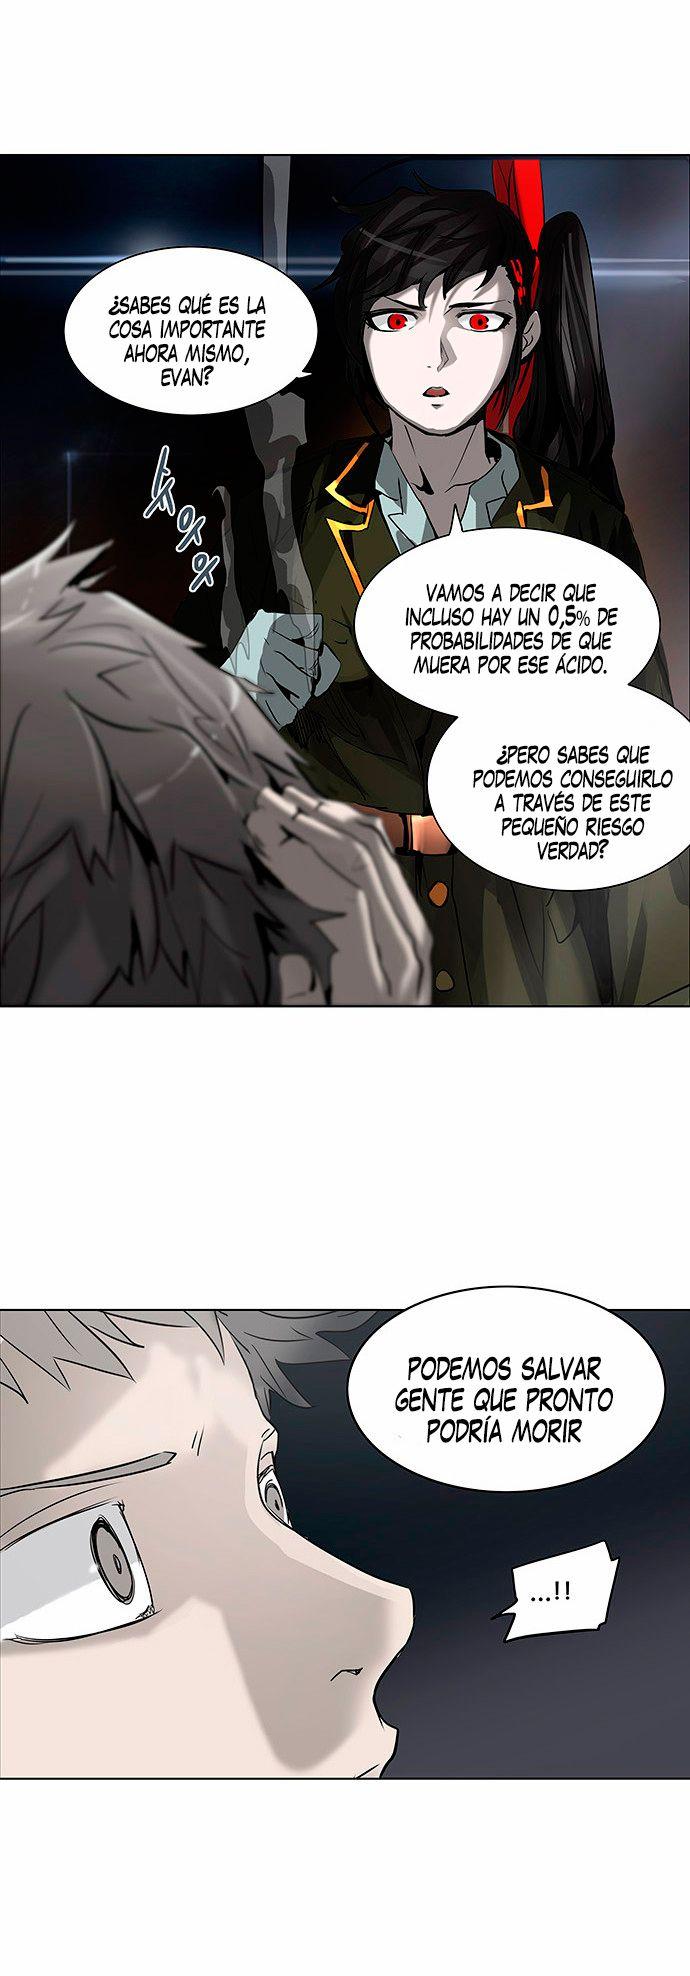 http://c5.ninemanga.com/es_manga/21/149/461659/02b7a3fbcfb03d3beb3601405b3bc5c6.jpg Page 5